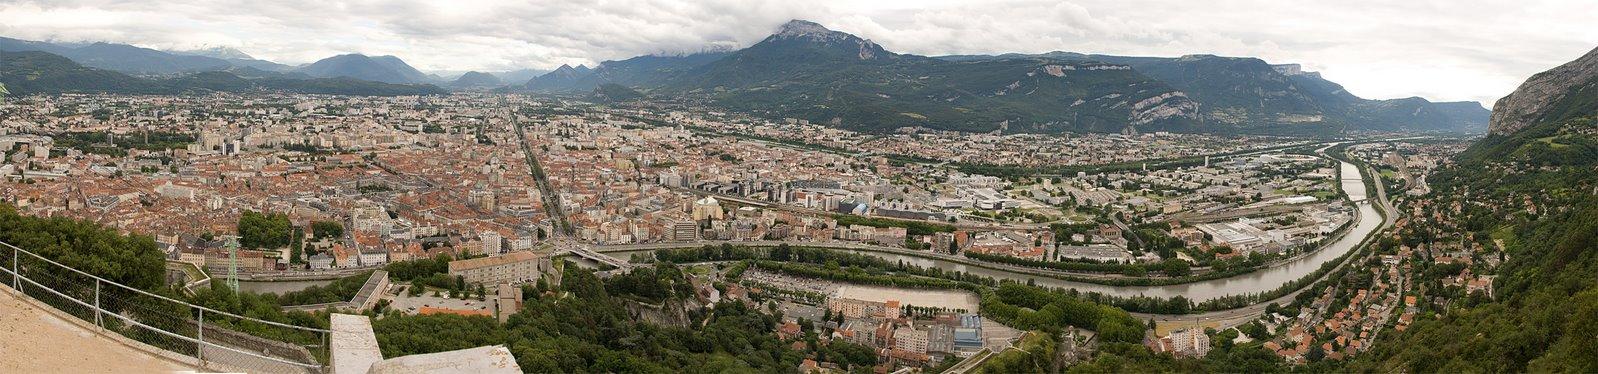 [Grenoble_wide_panorama]